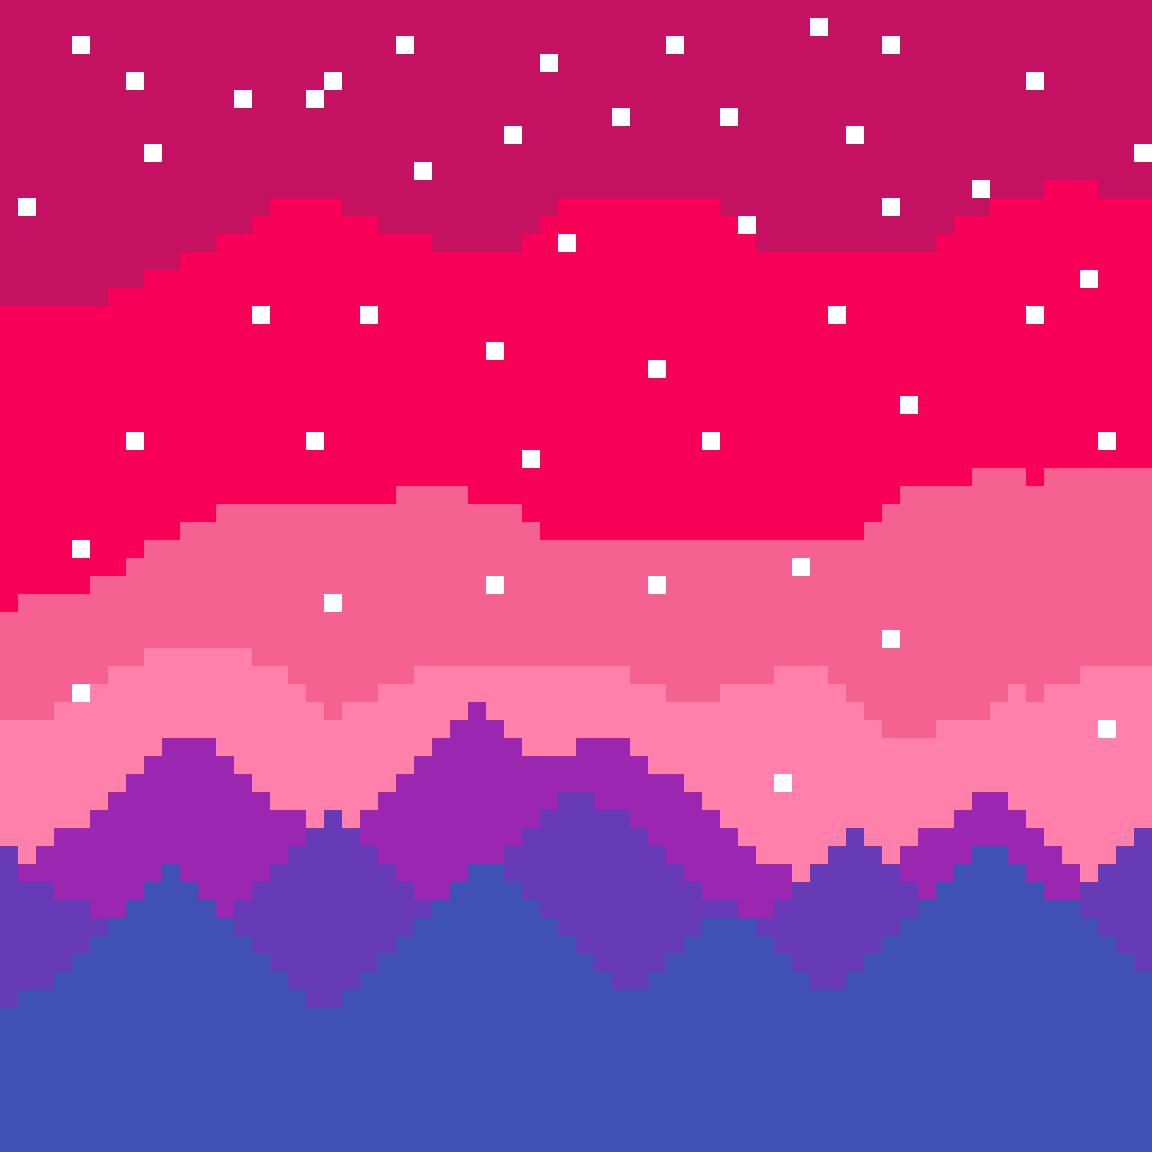 Sunset Skyline by N-K524